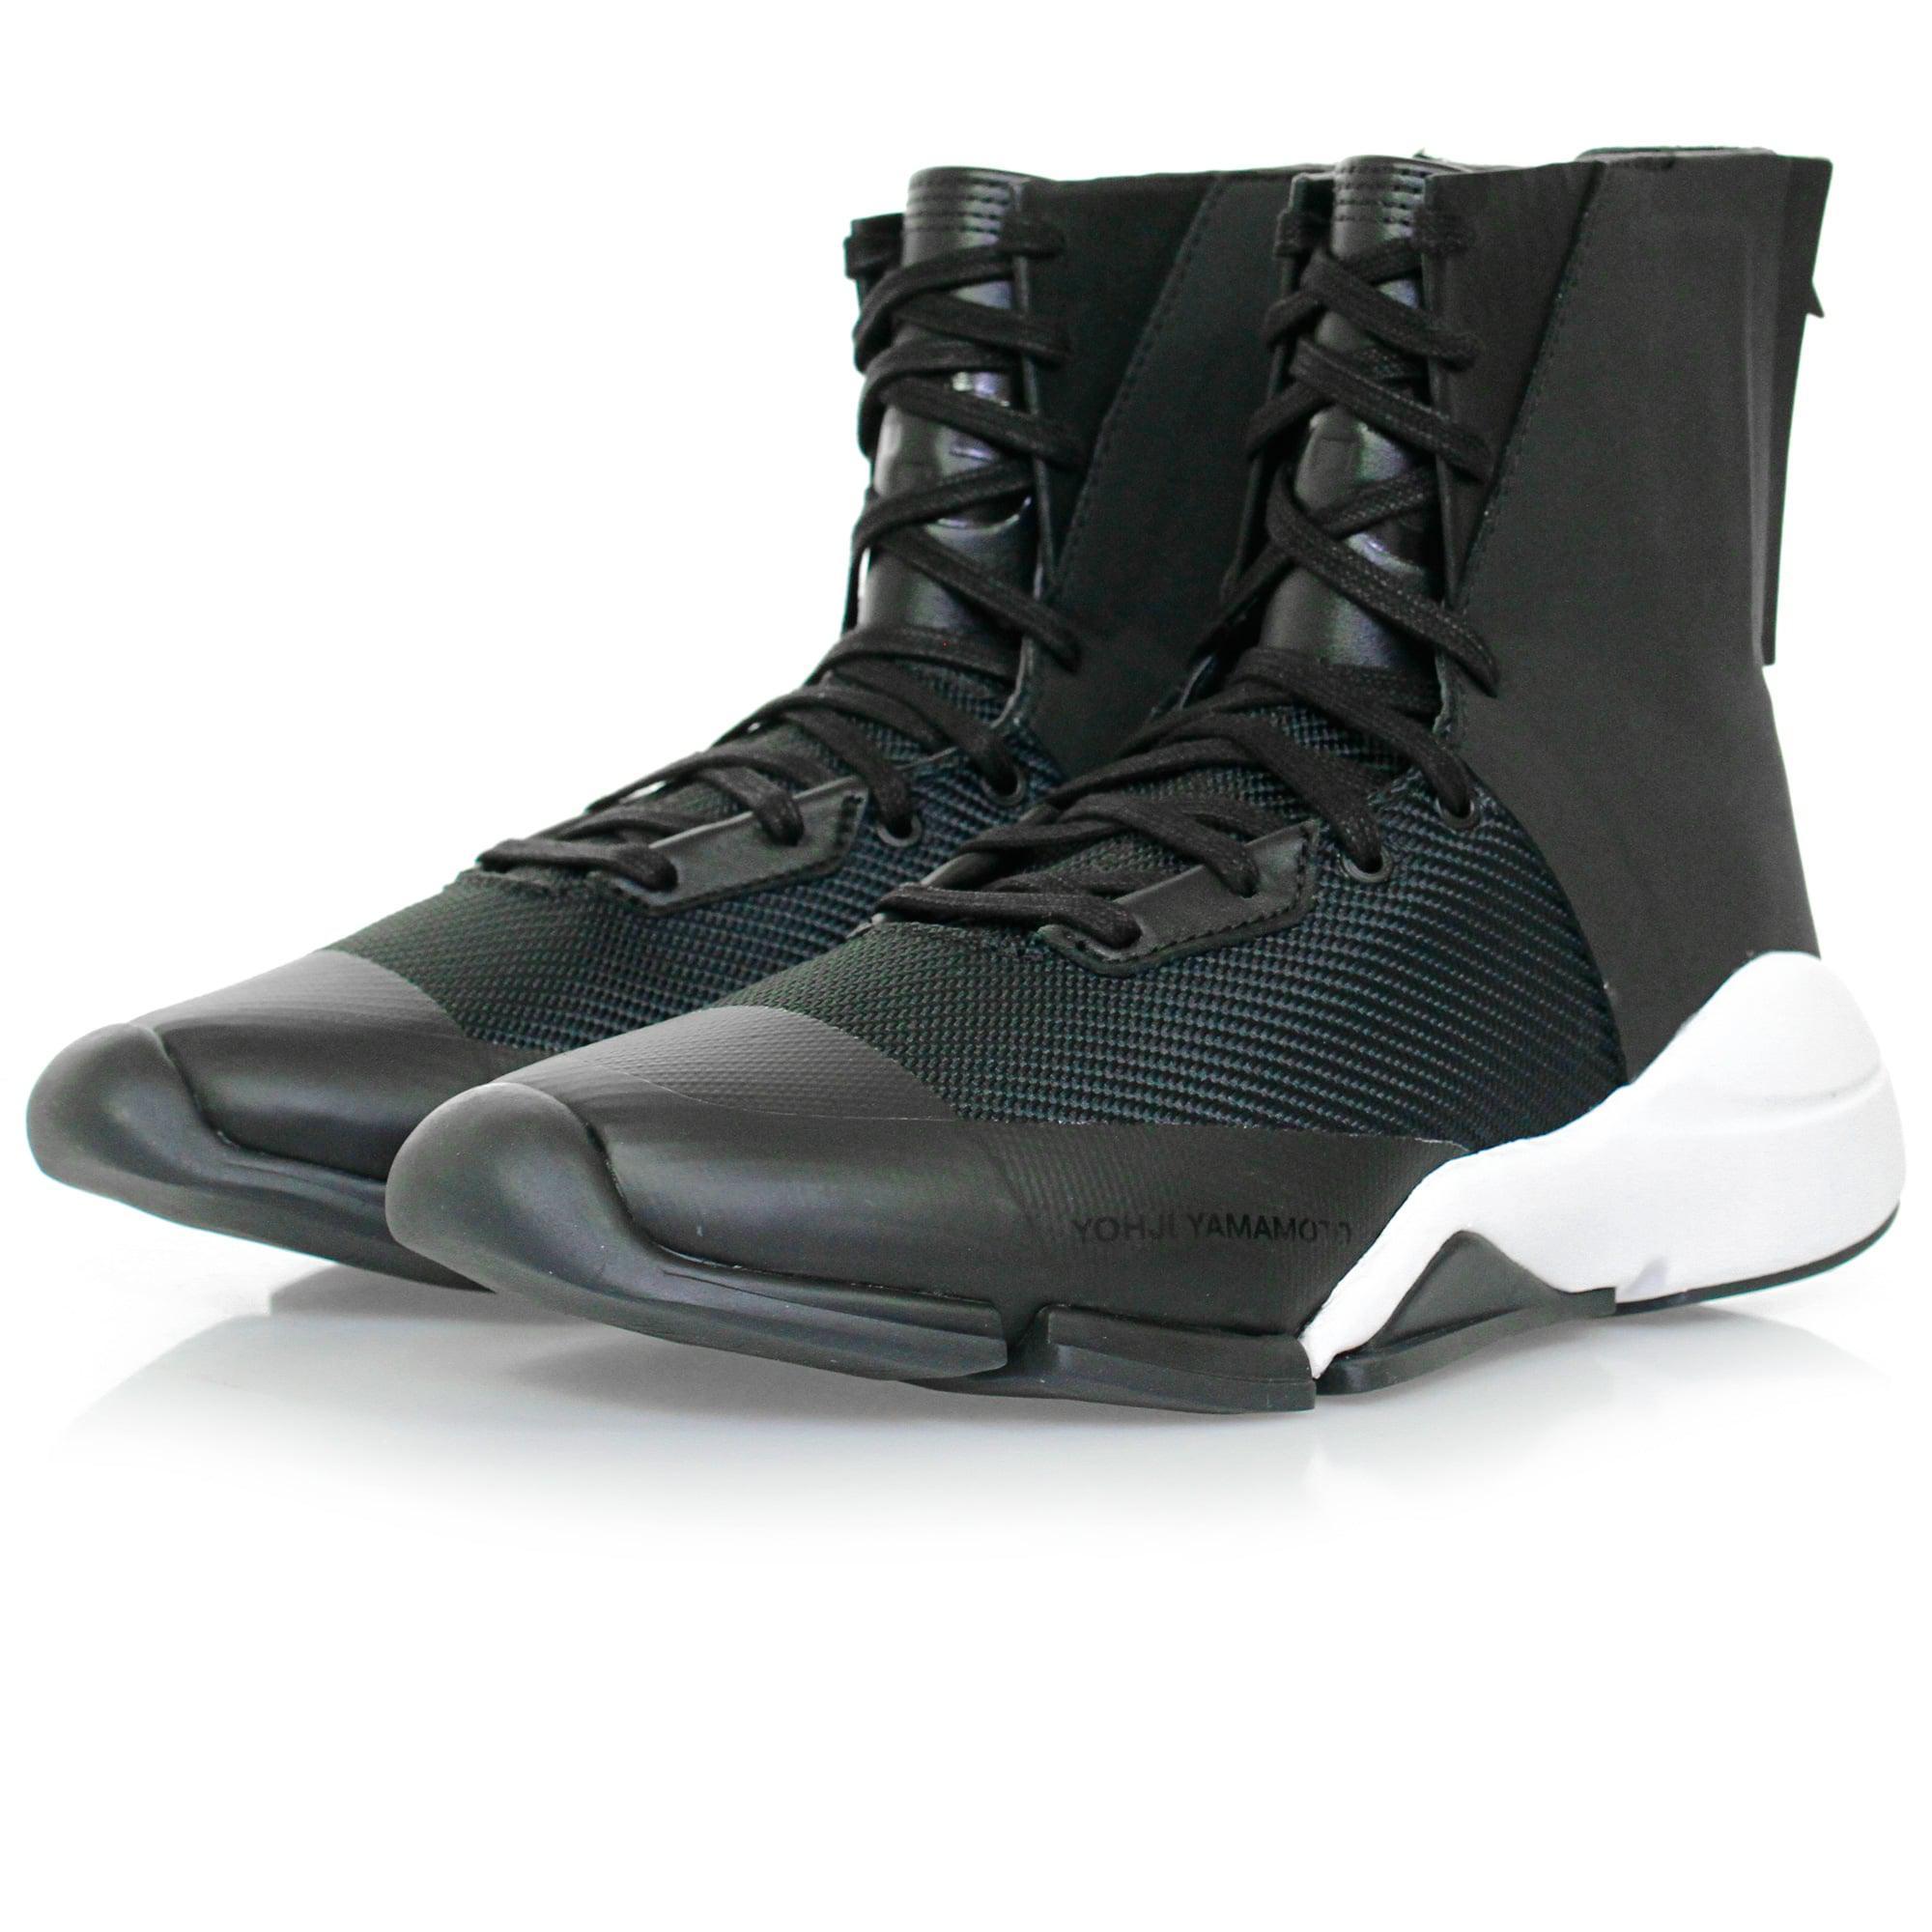 68478cda5f72c Lyst - Y-3 Future Zip High Black Boot Bb4804 in Black for Men - Save 29%